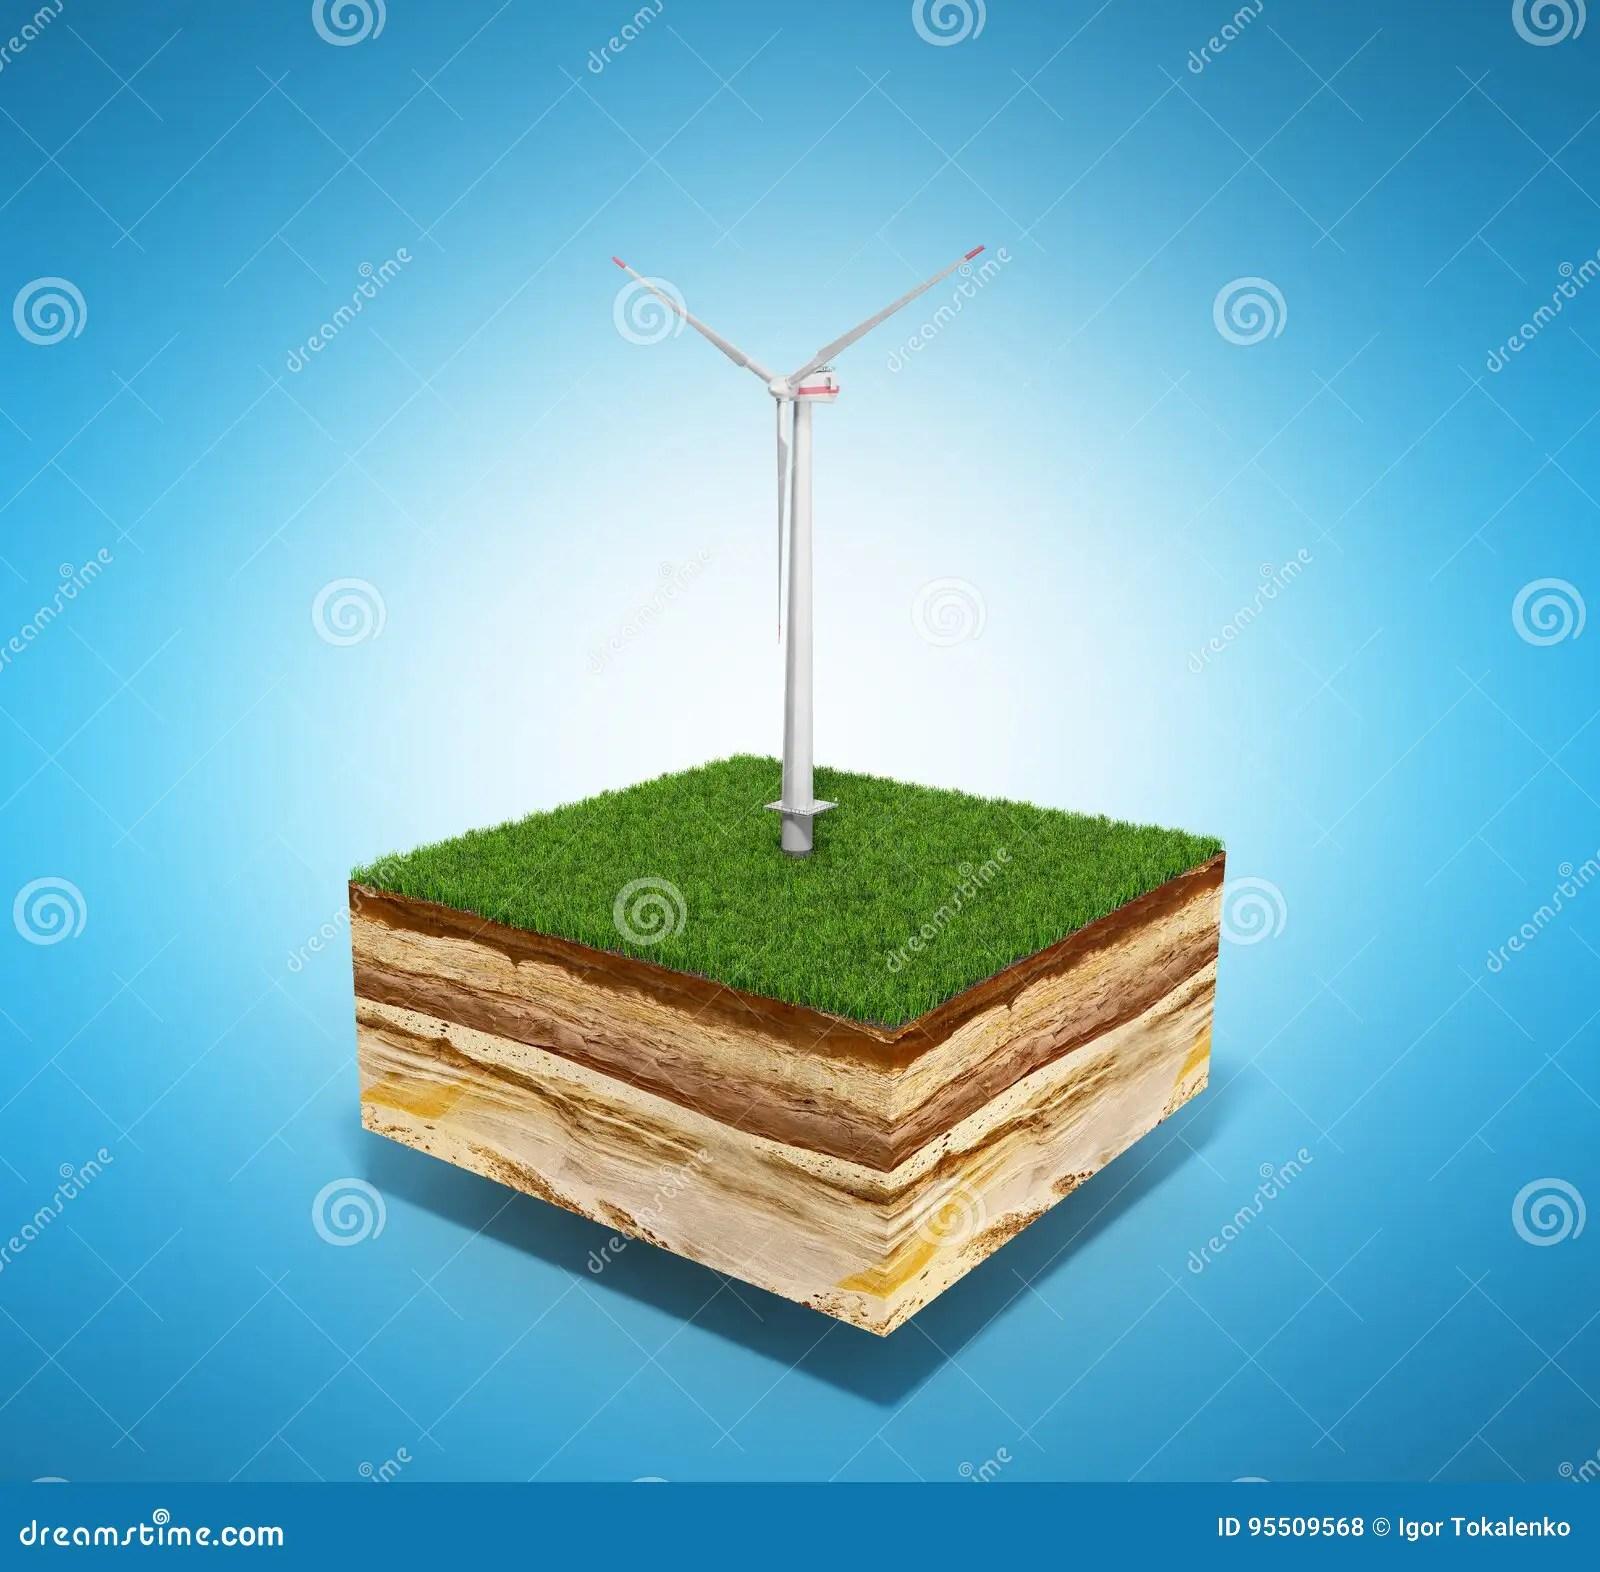 Concept Of Alternative Energy 3d Illustration Of Cross